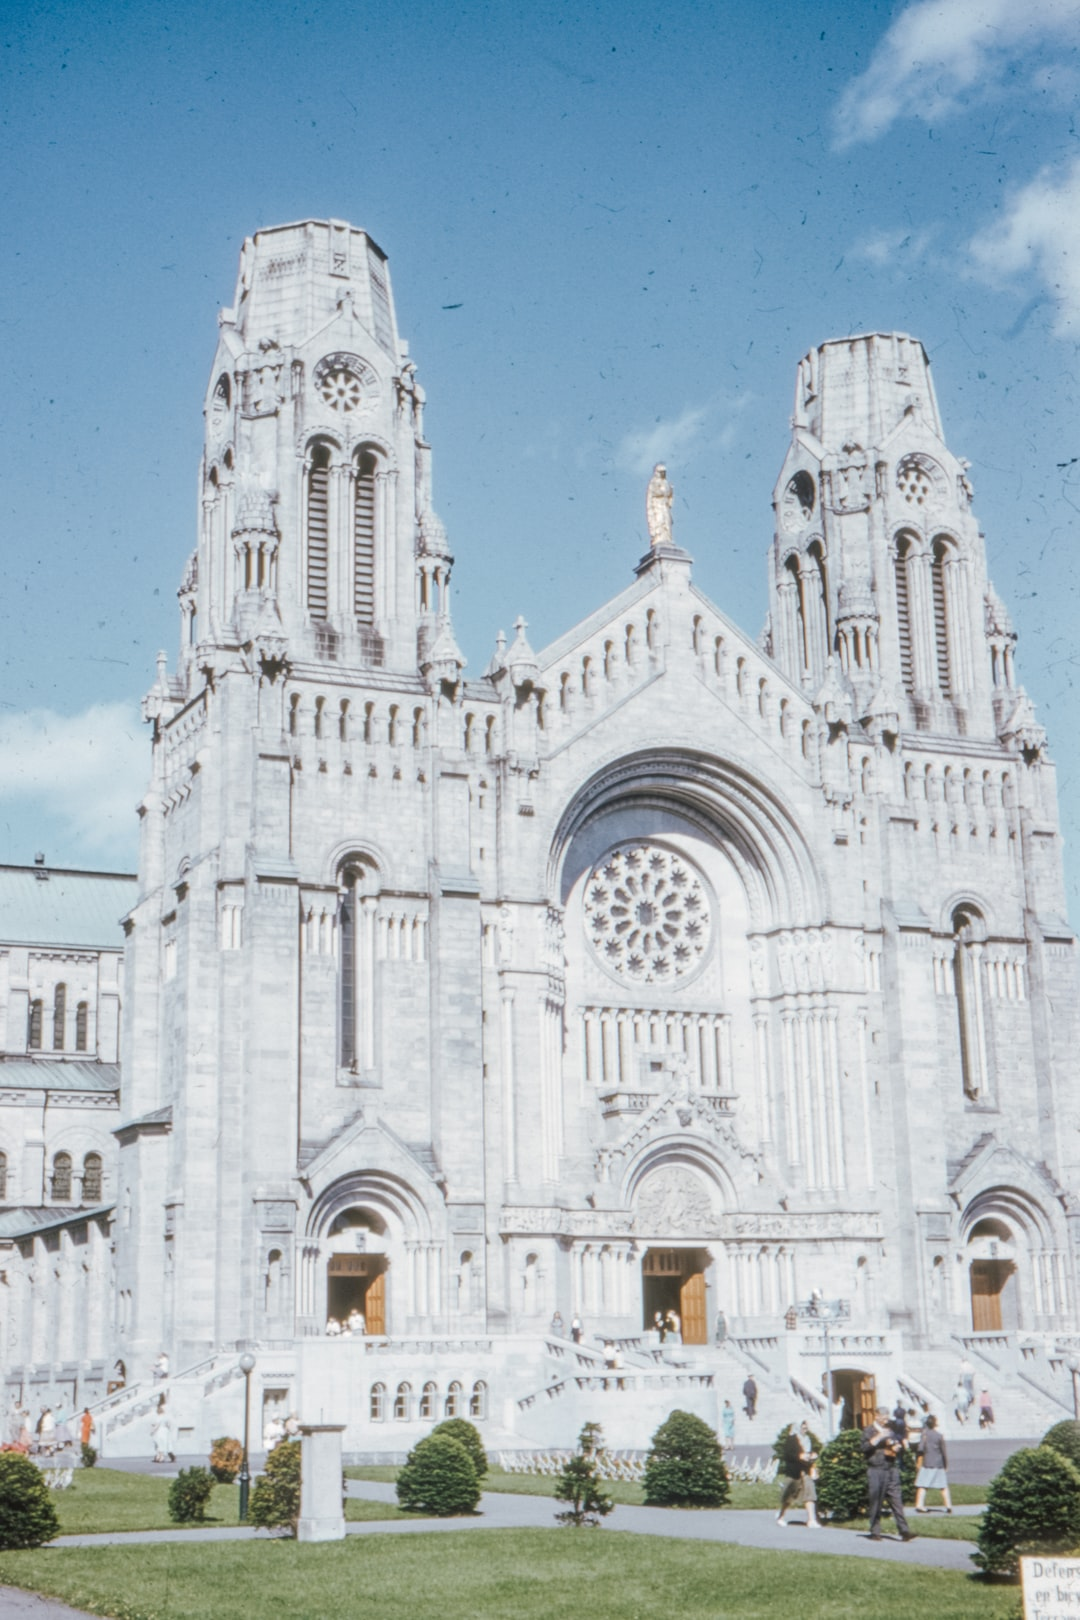 Sainte Anne de Beaupre, QC, Canada, July 1959